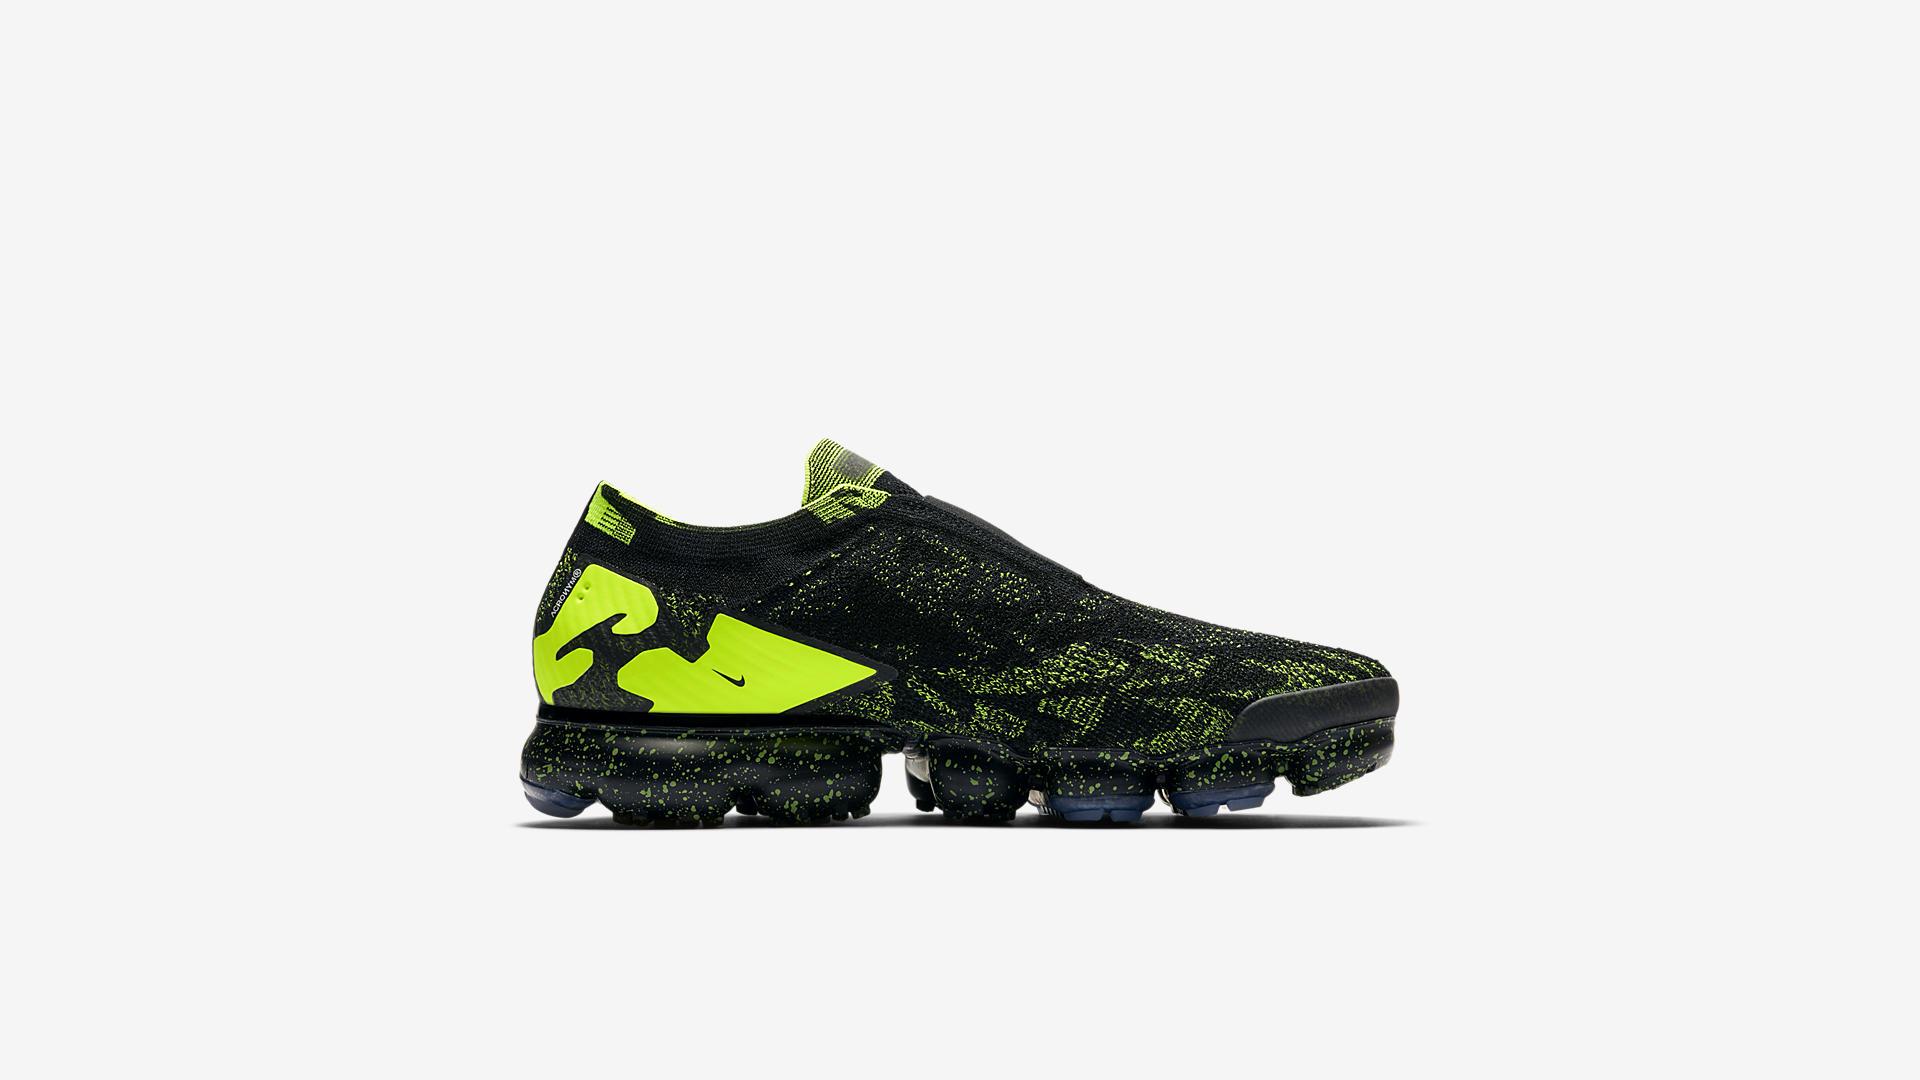 AQ0996 007 ACRONYM x Nike Air Vapormax Moc 2 Black Volt 3